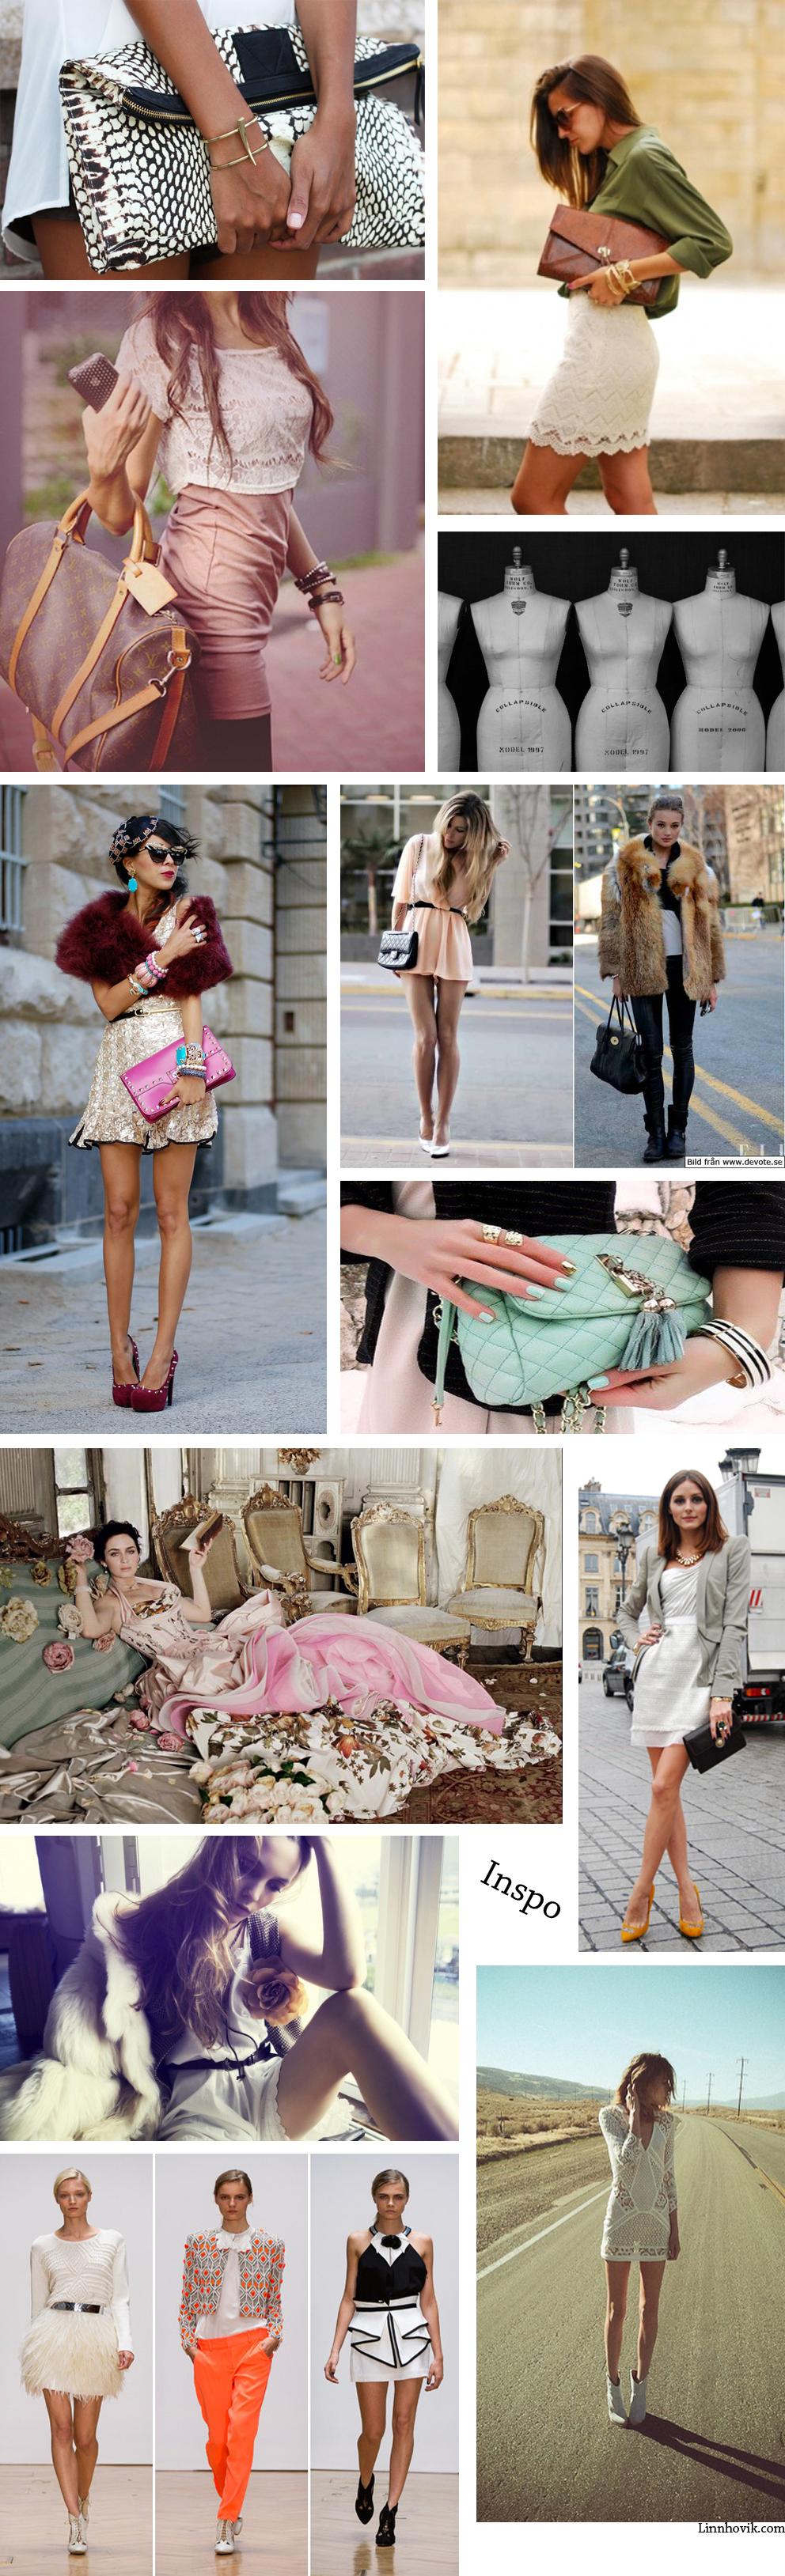 fashioninspo